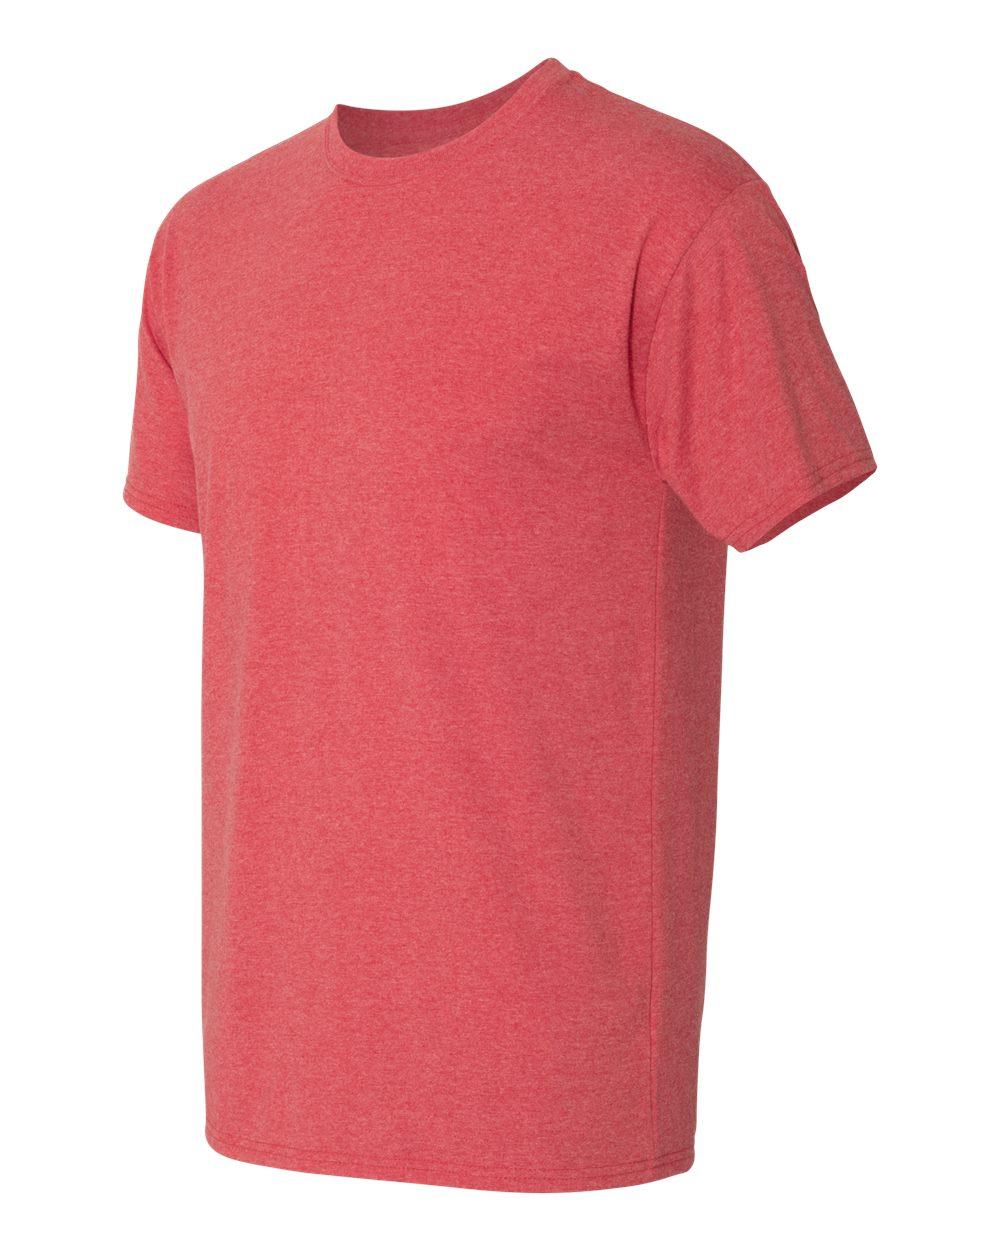 Hanes-Men-039-s-X-Temp-Triblend-T-Shirt-With-Fresh-Iq-42TB-S-3XL thumbnail 10